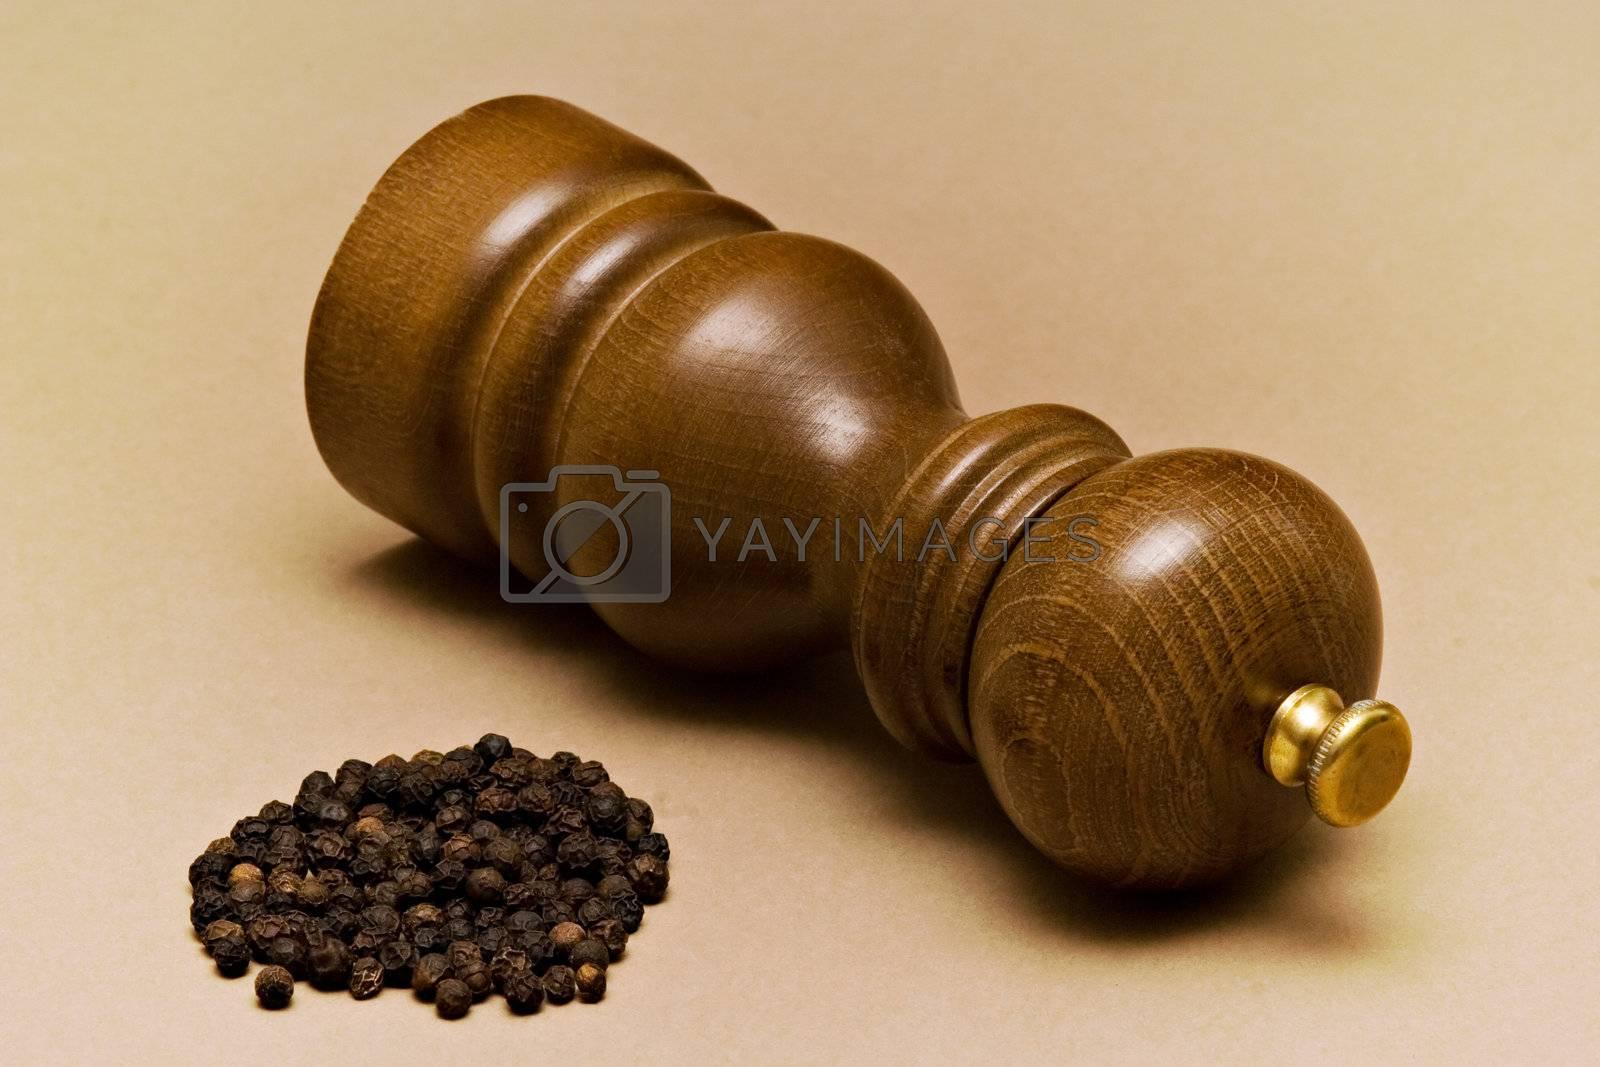 Pepper-mill and black pepper grains